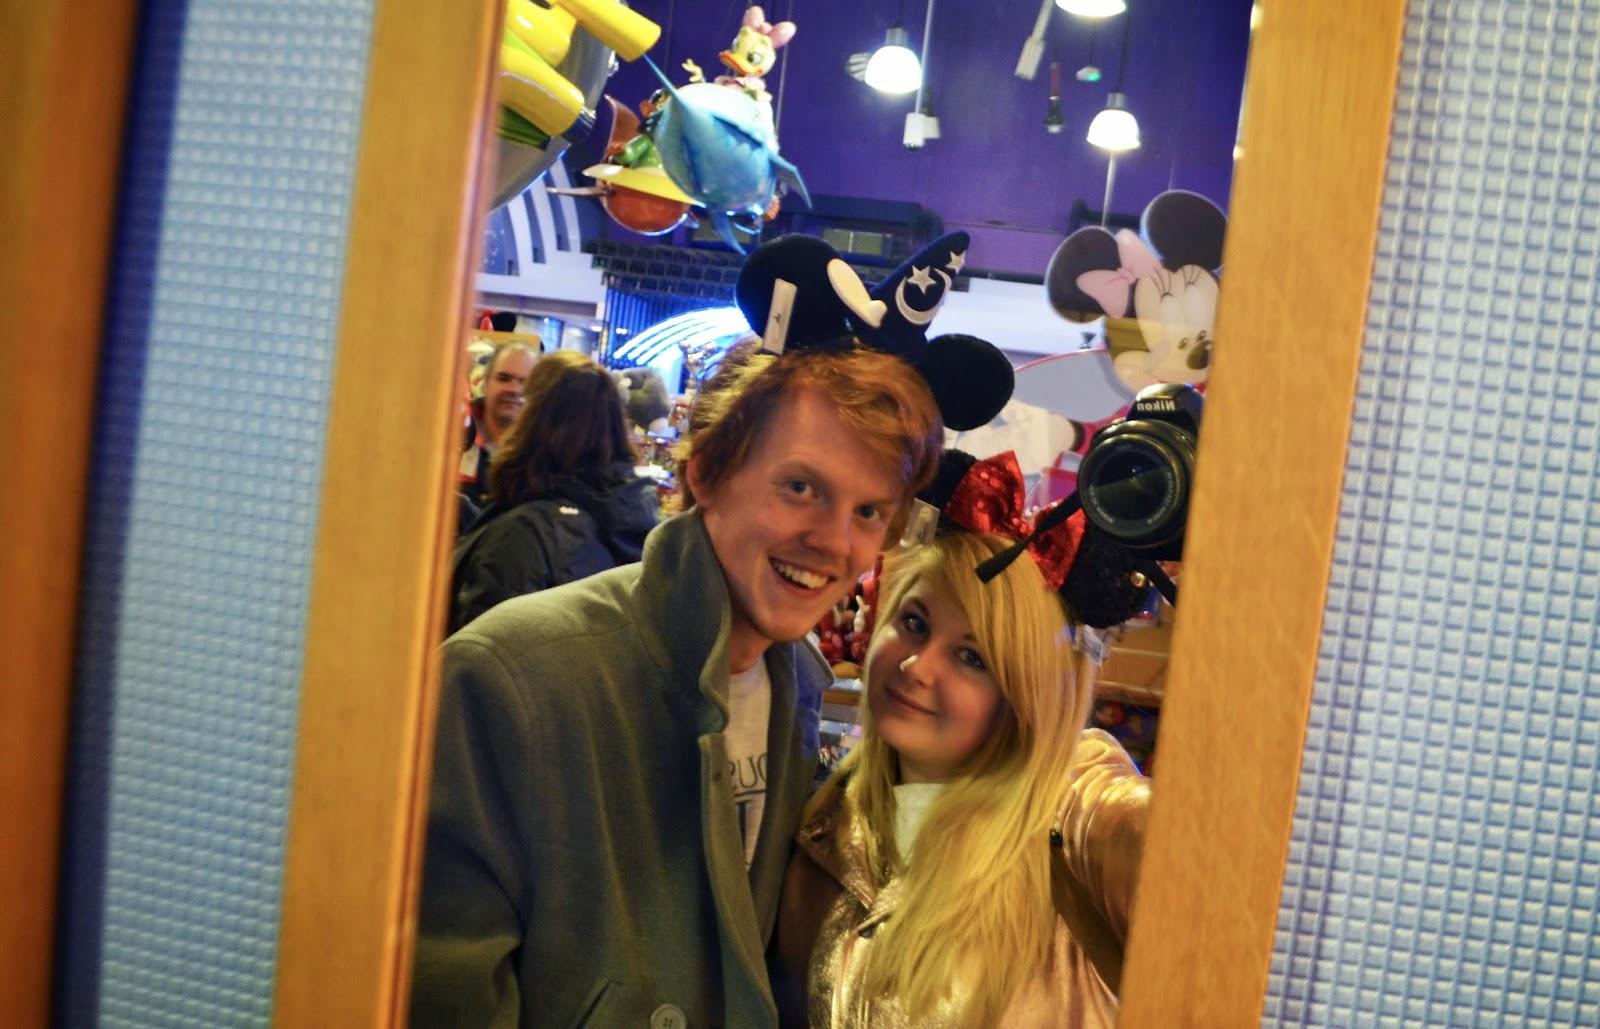 a mirror selfie taken in a shop in the Disney Village. We are both wearing Disney mouse ears